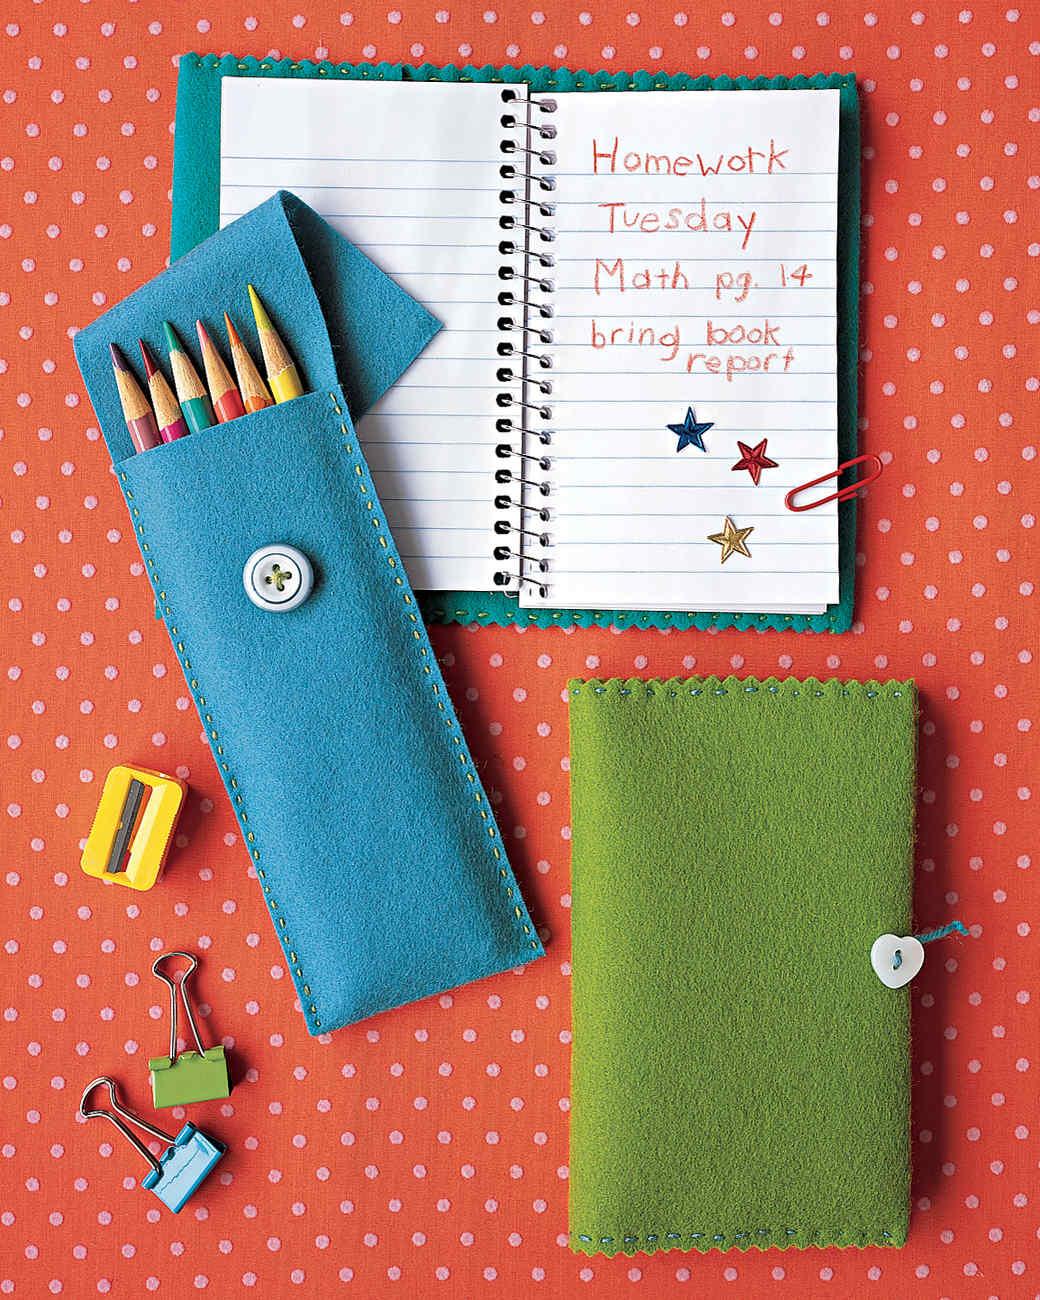 Felt pencil case for School diy ideas